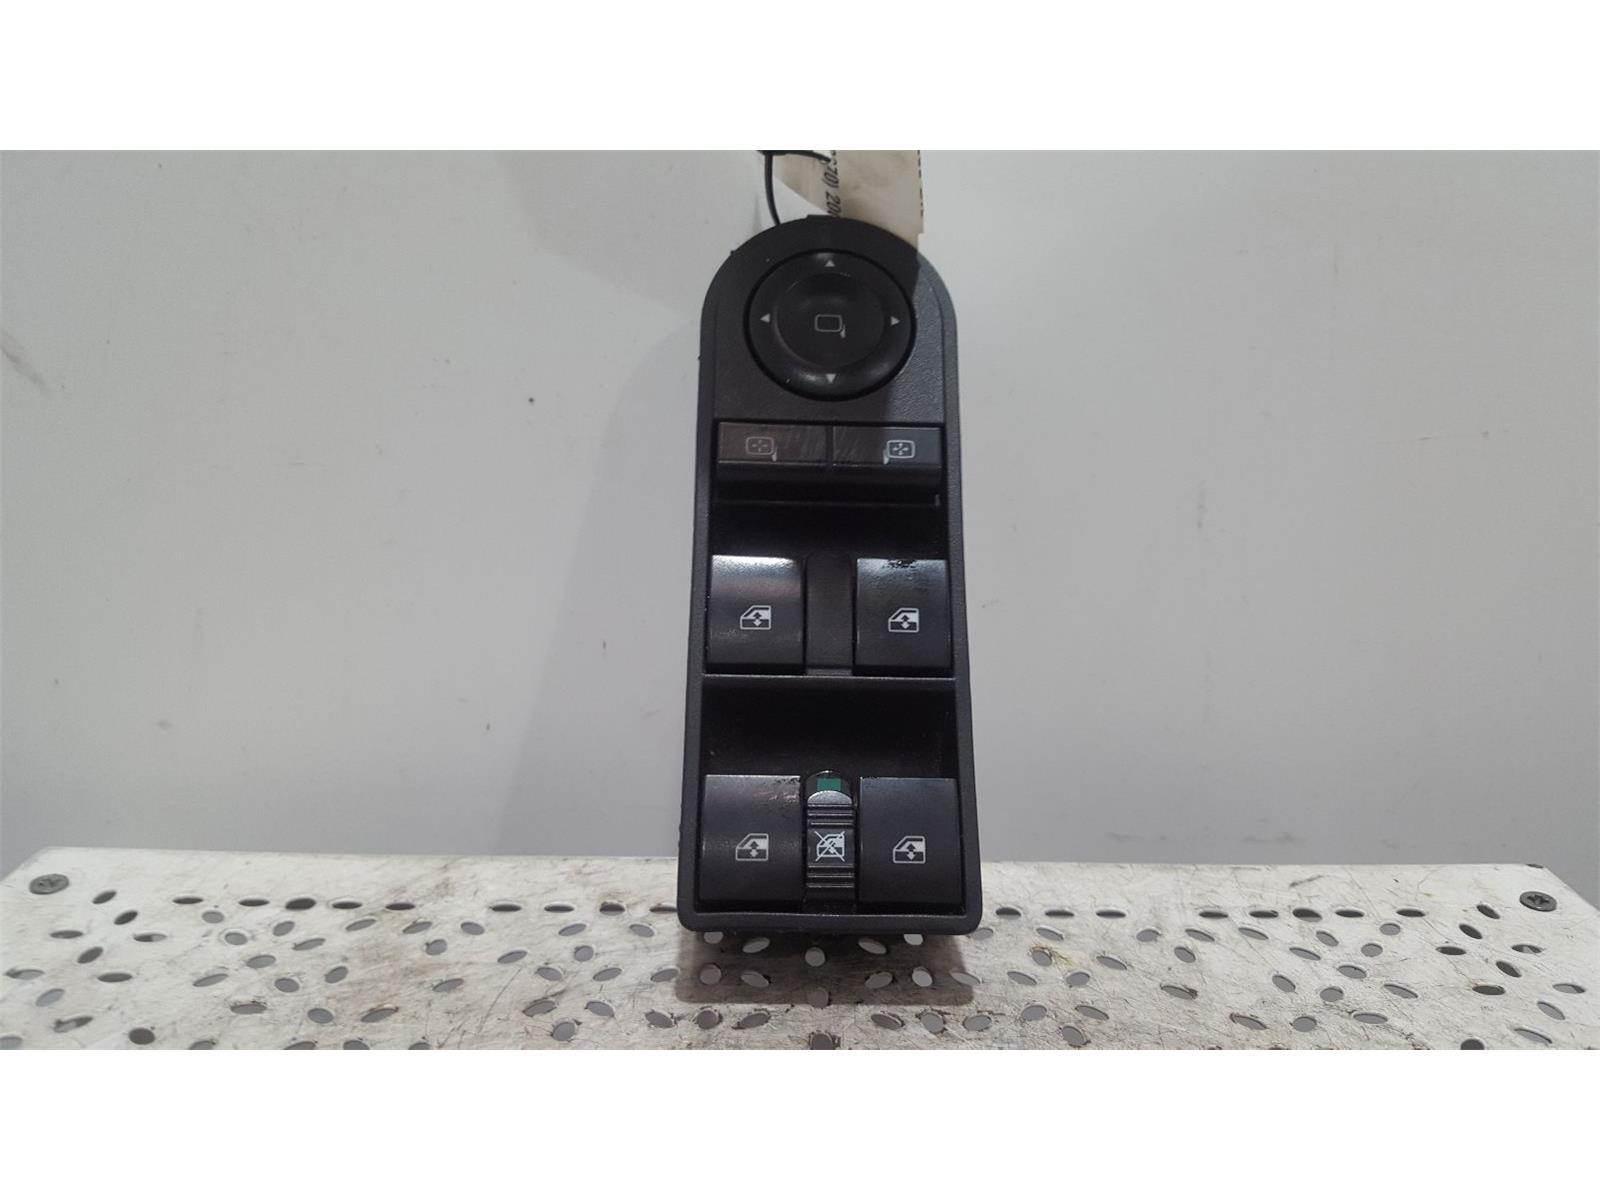 VAUXHALL ZAFIRA MK2 (B) (A3370) 2005 TO 2014 - Window Switches / Control Panel